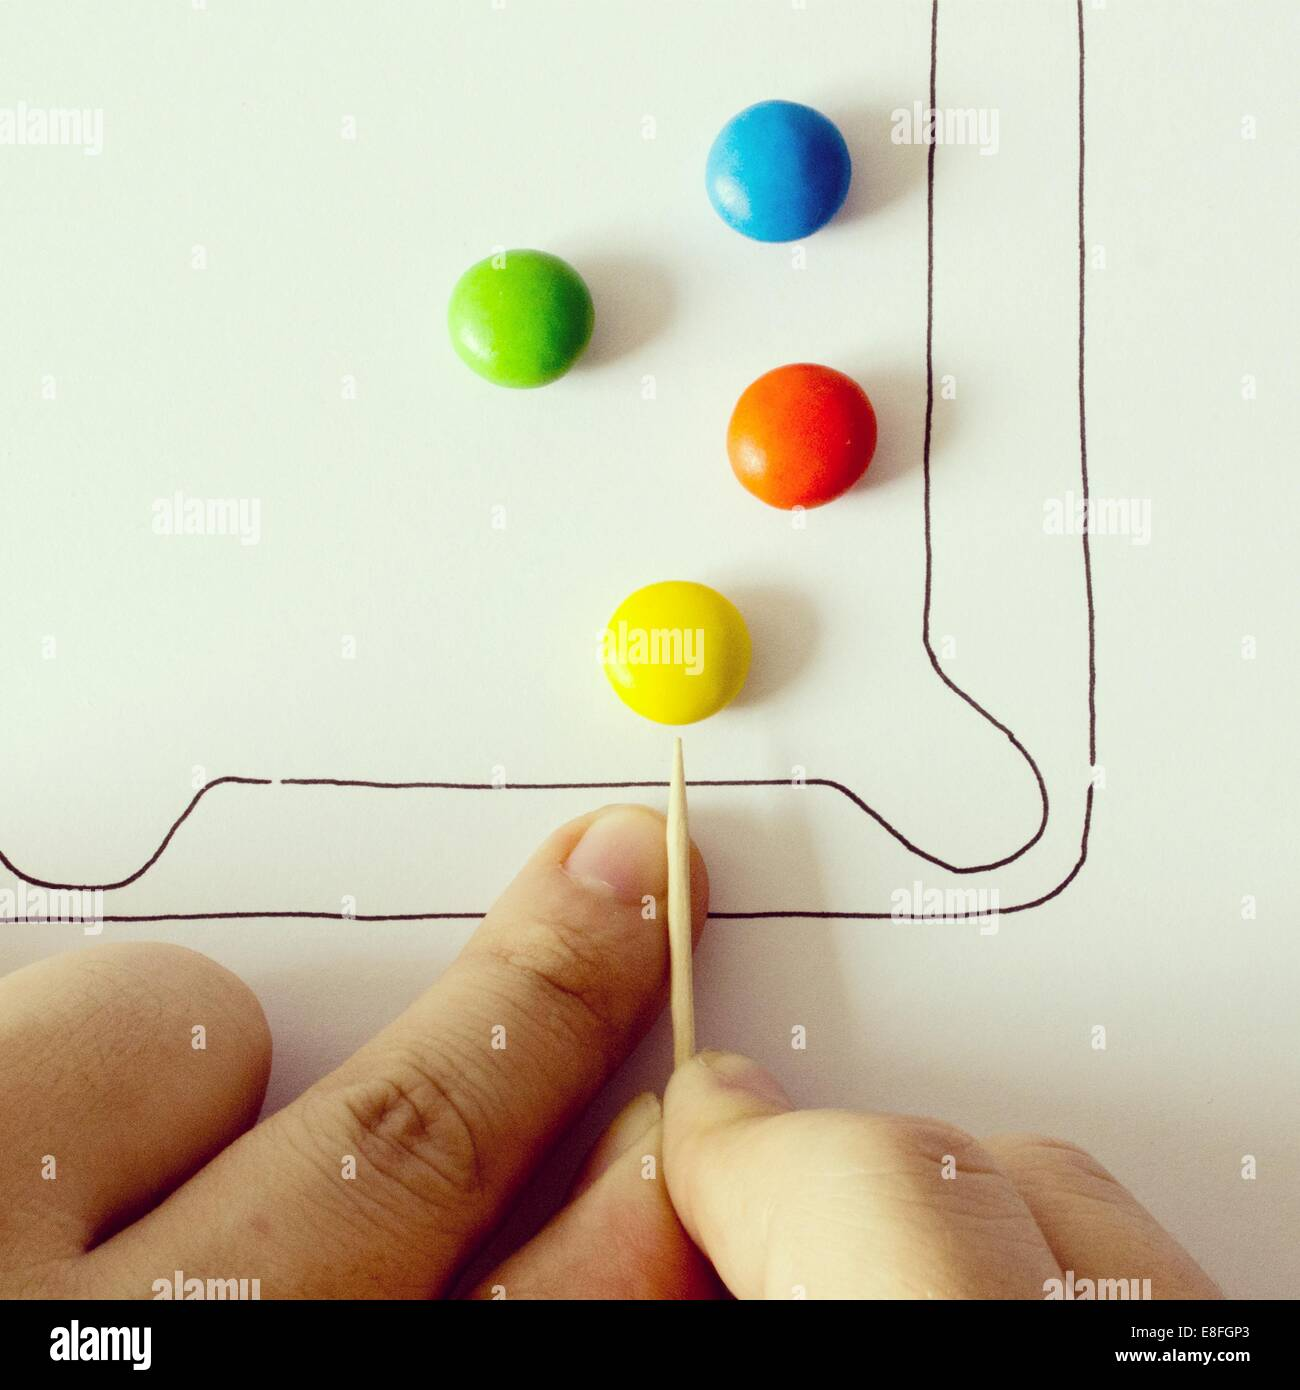 Illustration des Pool-Spiel mit bunten Bonbons Stockbild